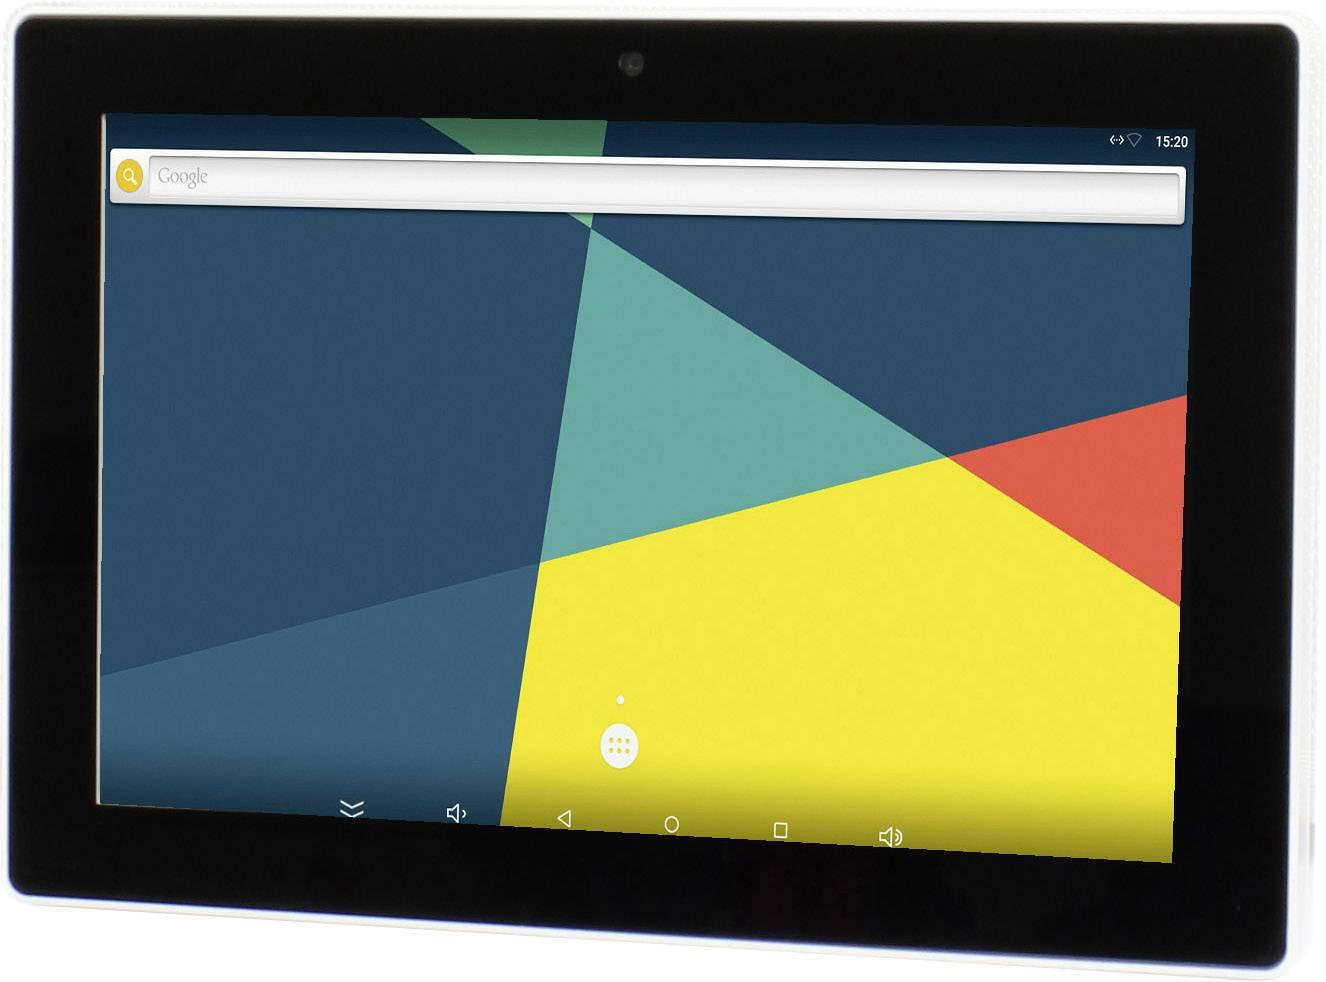 "Tablet s OS Android Allnet 10A64A60PoE, 10.1 "", Quad Core 16 GB, Wi-Fi, bílá"